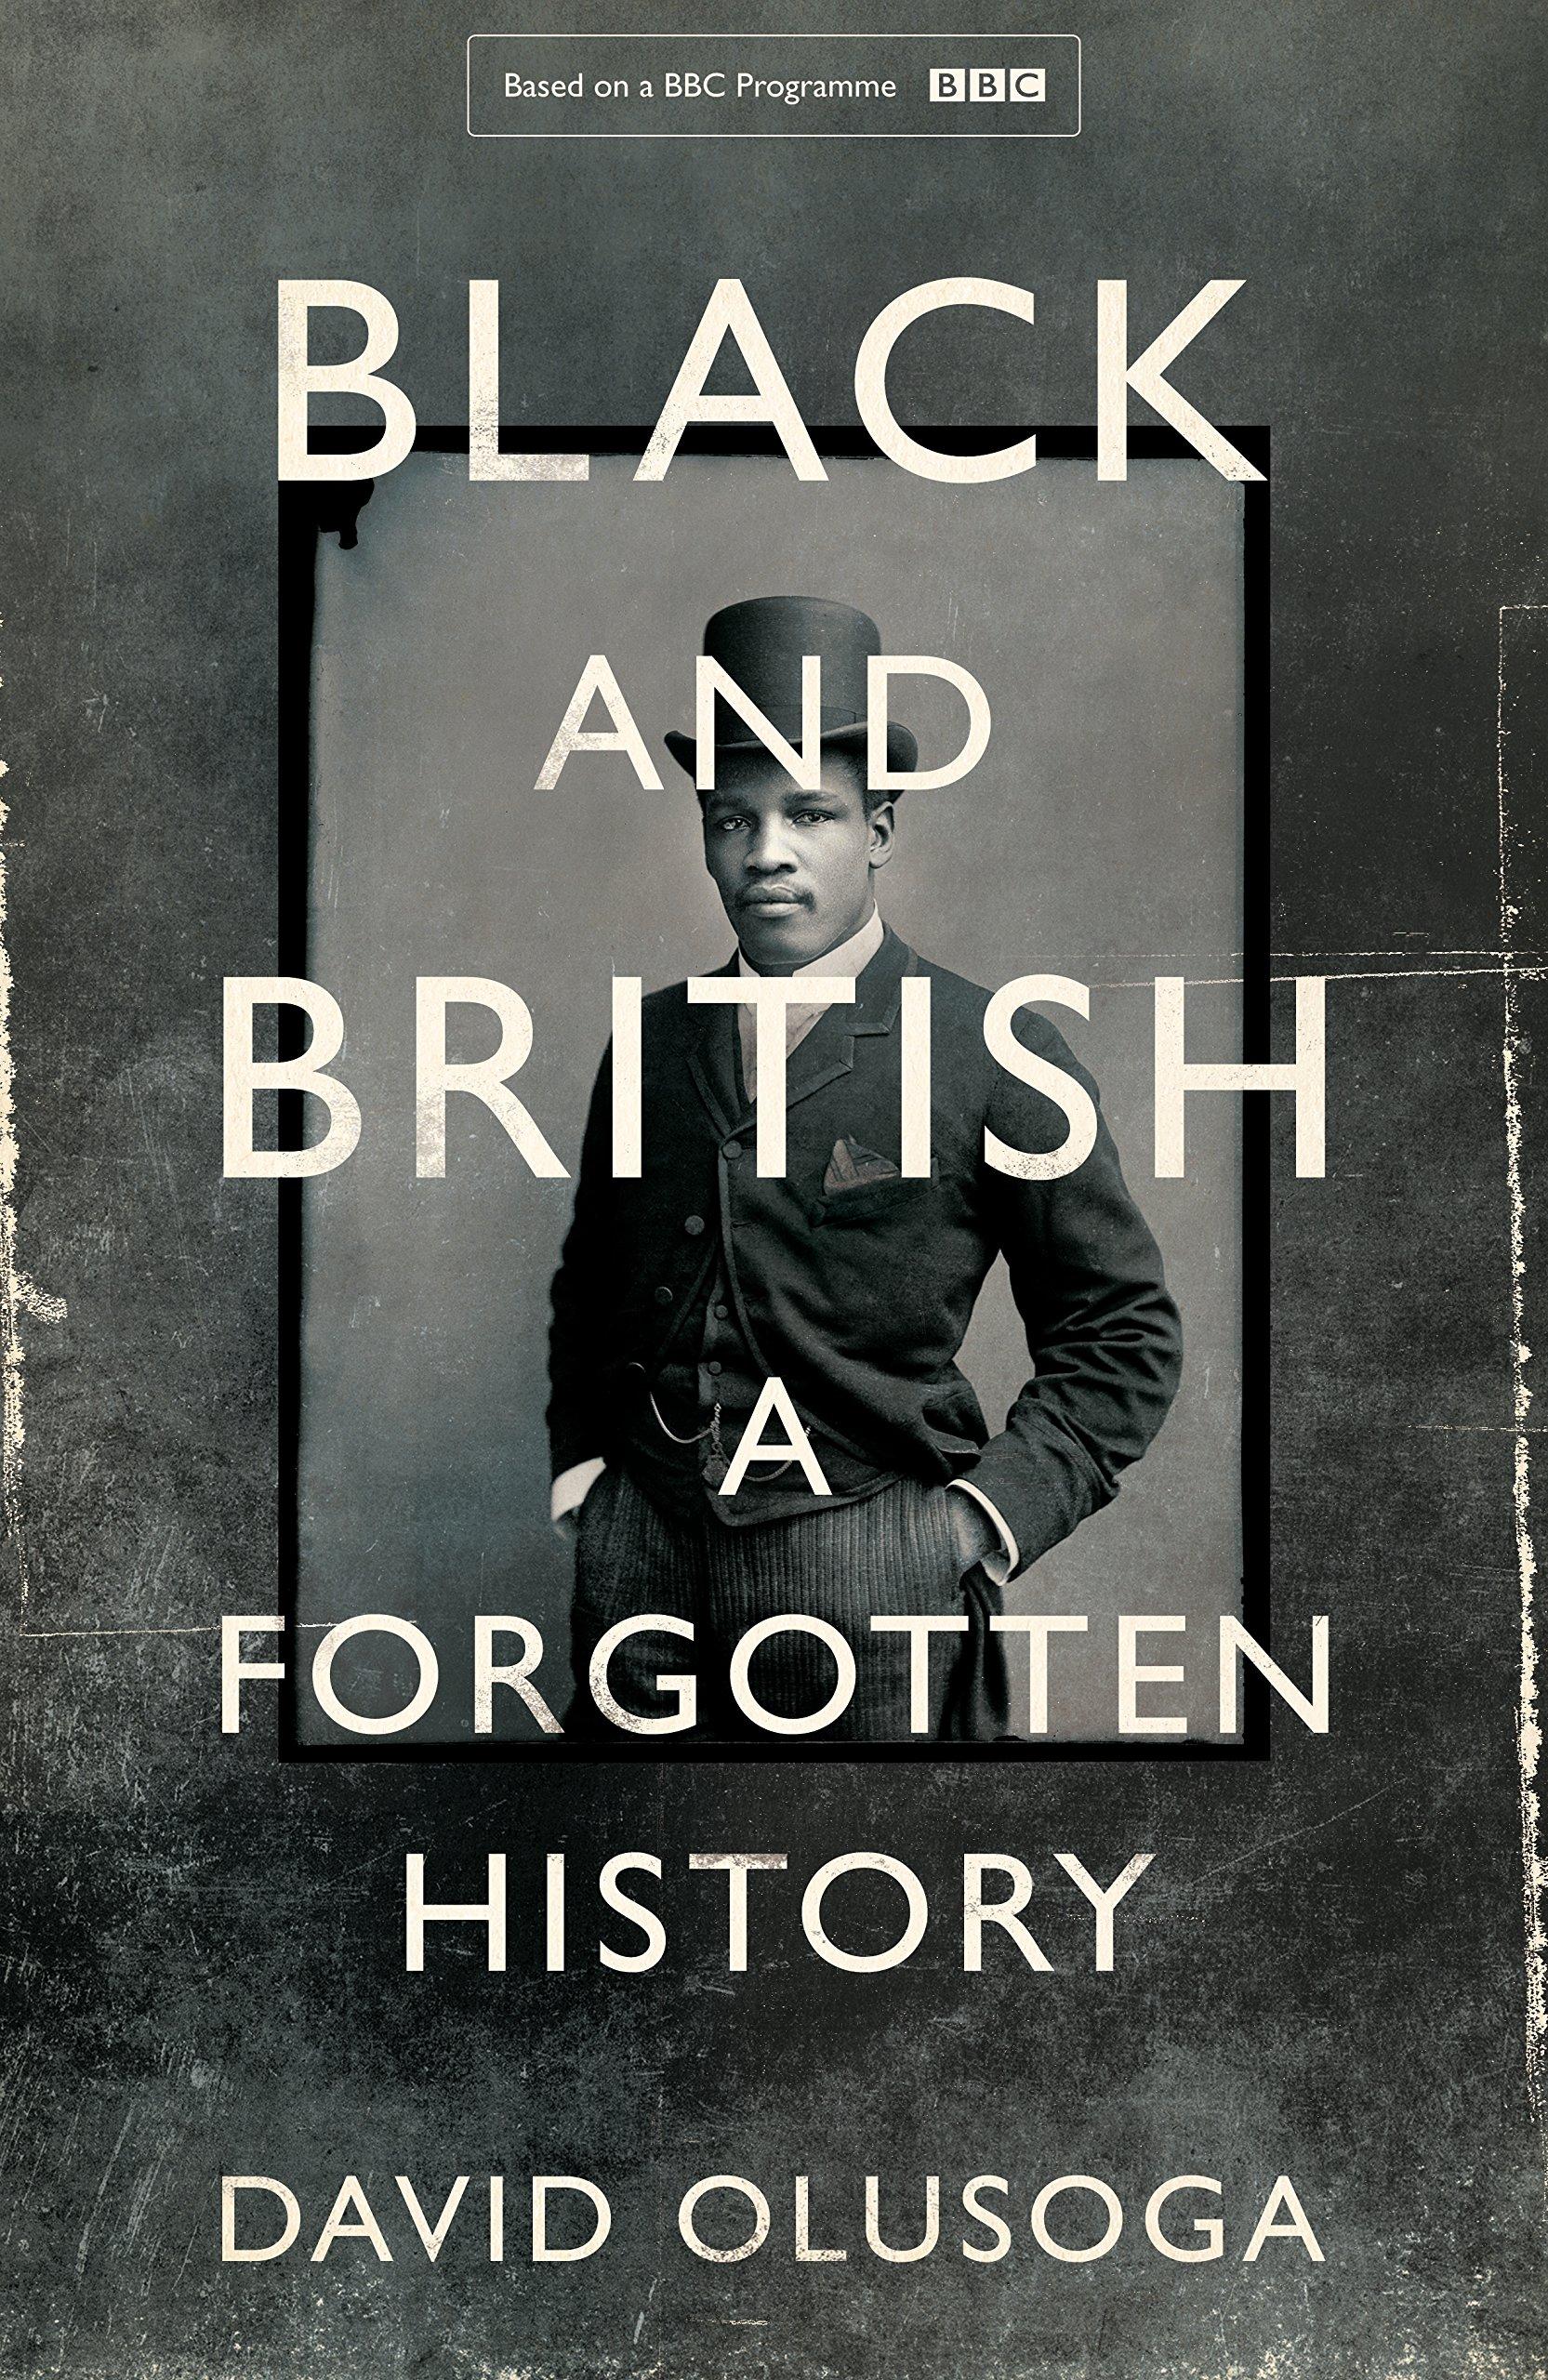 Black And British: A Forgotten History: Amazon: David Olusoga:  9781447299738: Books